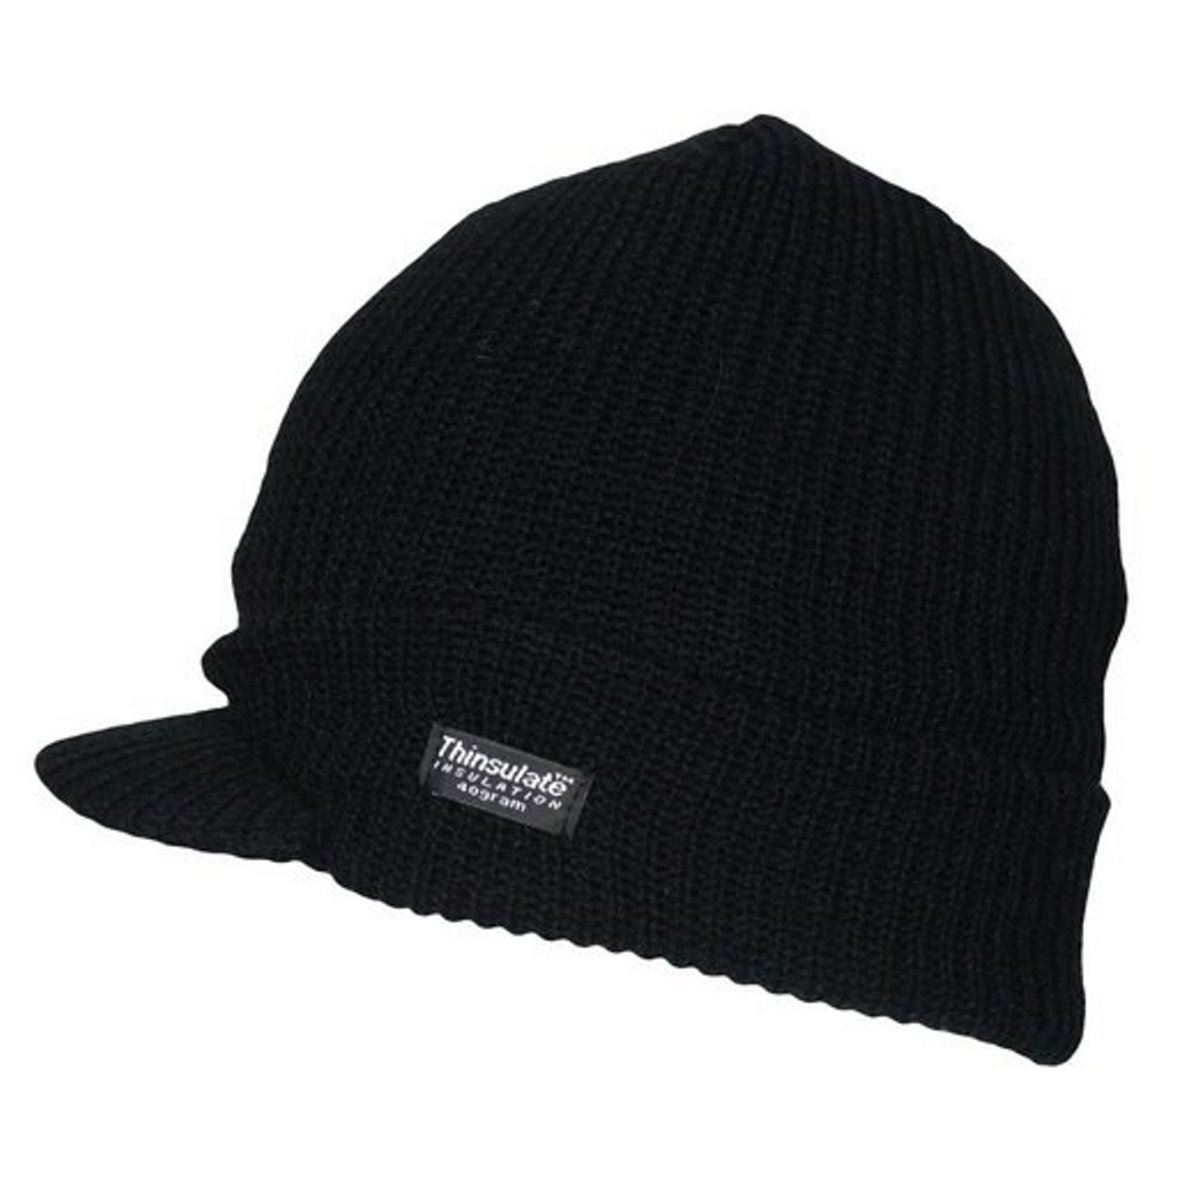 5323977c87f Adult BLACK Thinsulate Beanie Hat Cap Thermal German Winter Warm Ski Peak  Visor